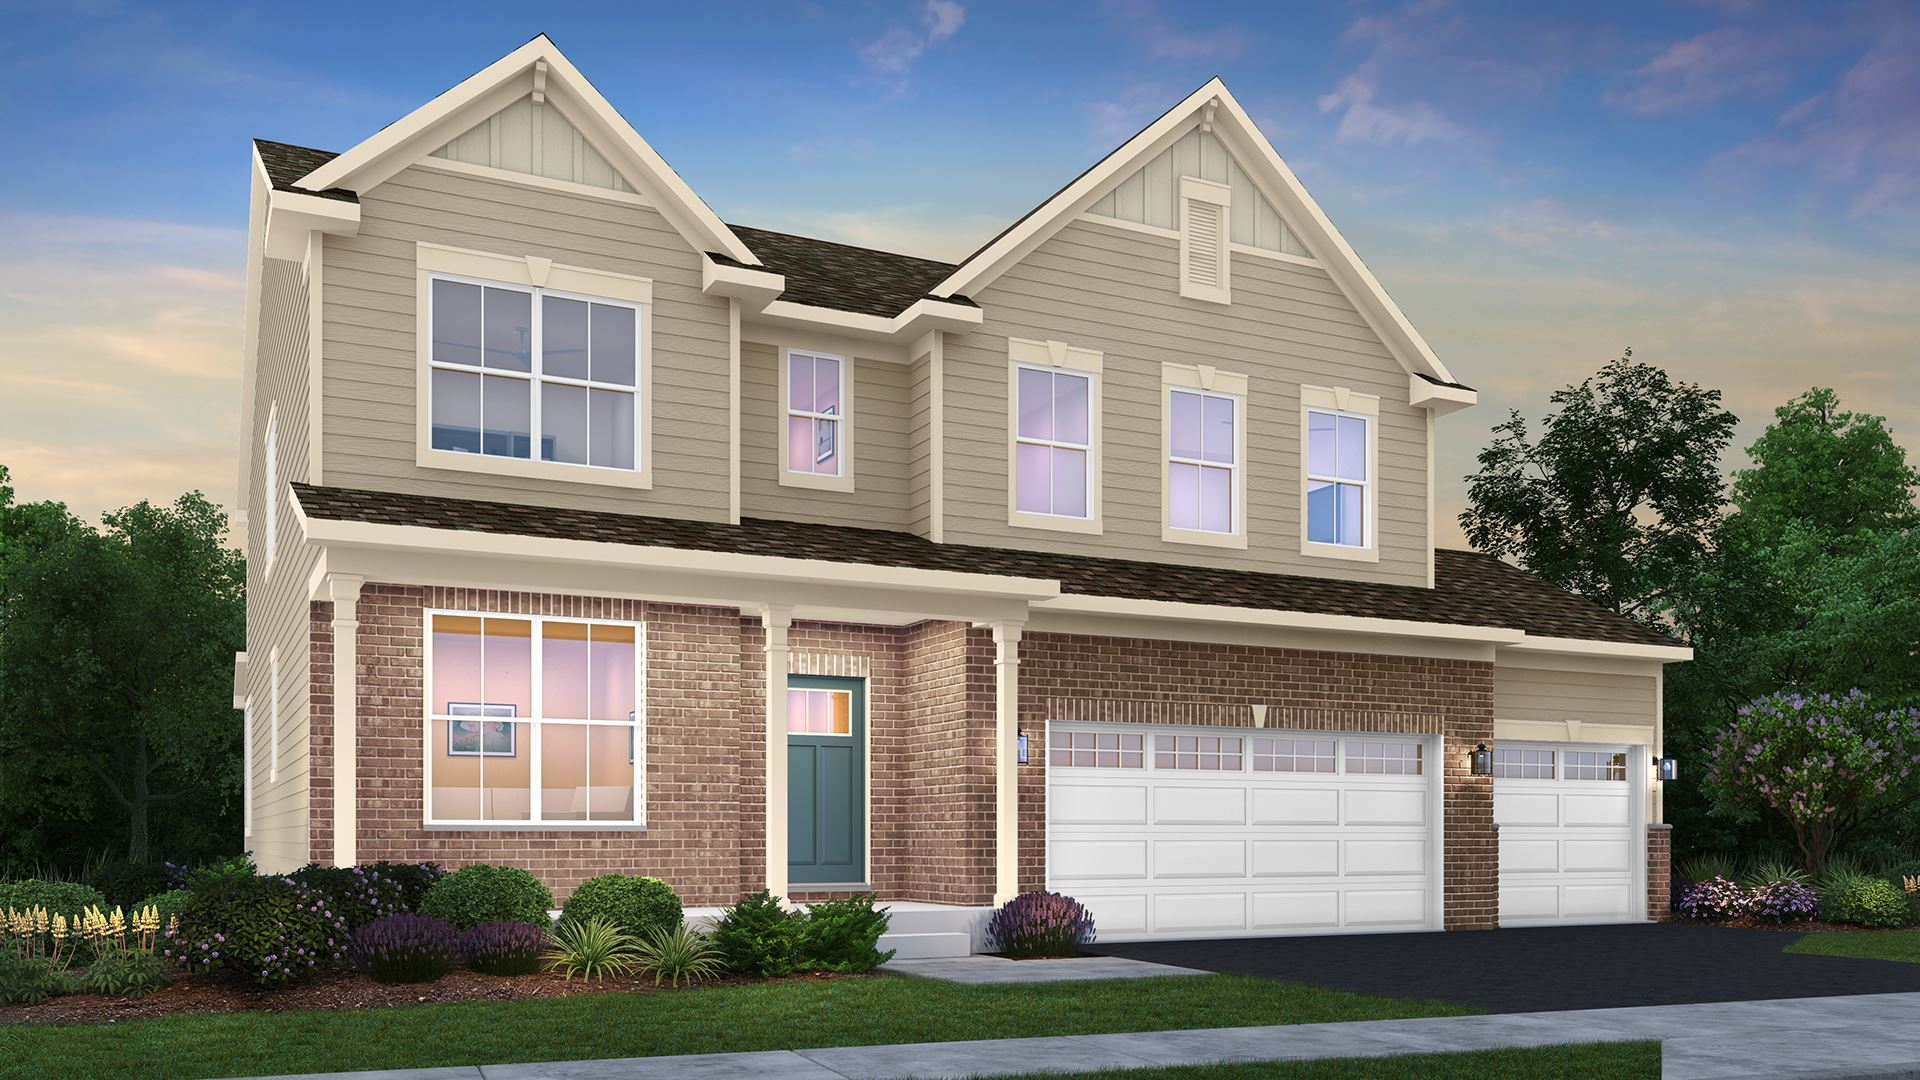 Photo of 16045 S Crescent Lane, Plainfield, IL 60586 (MLS # 11000931)